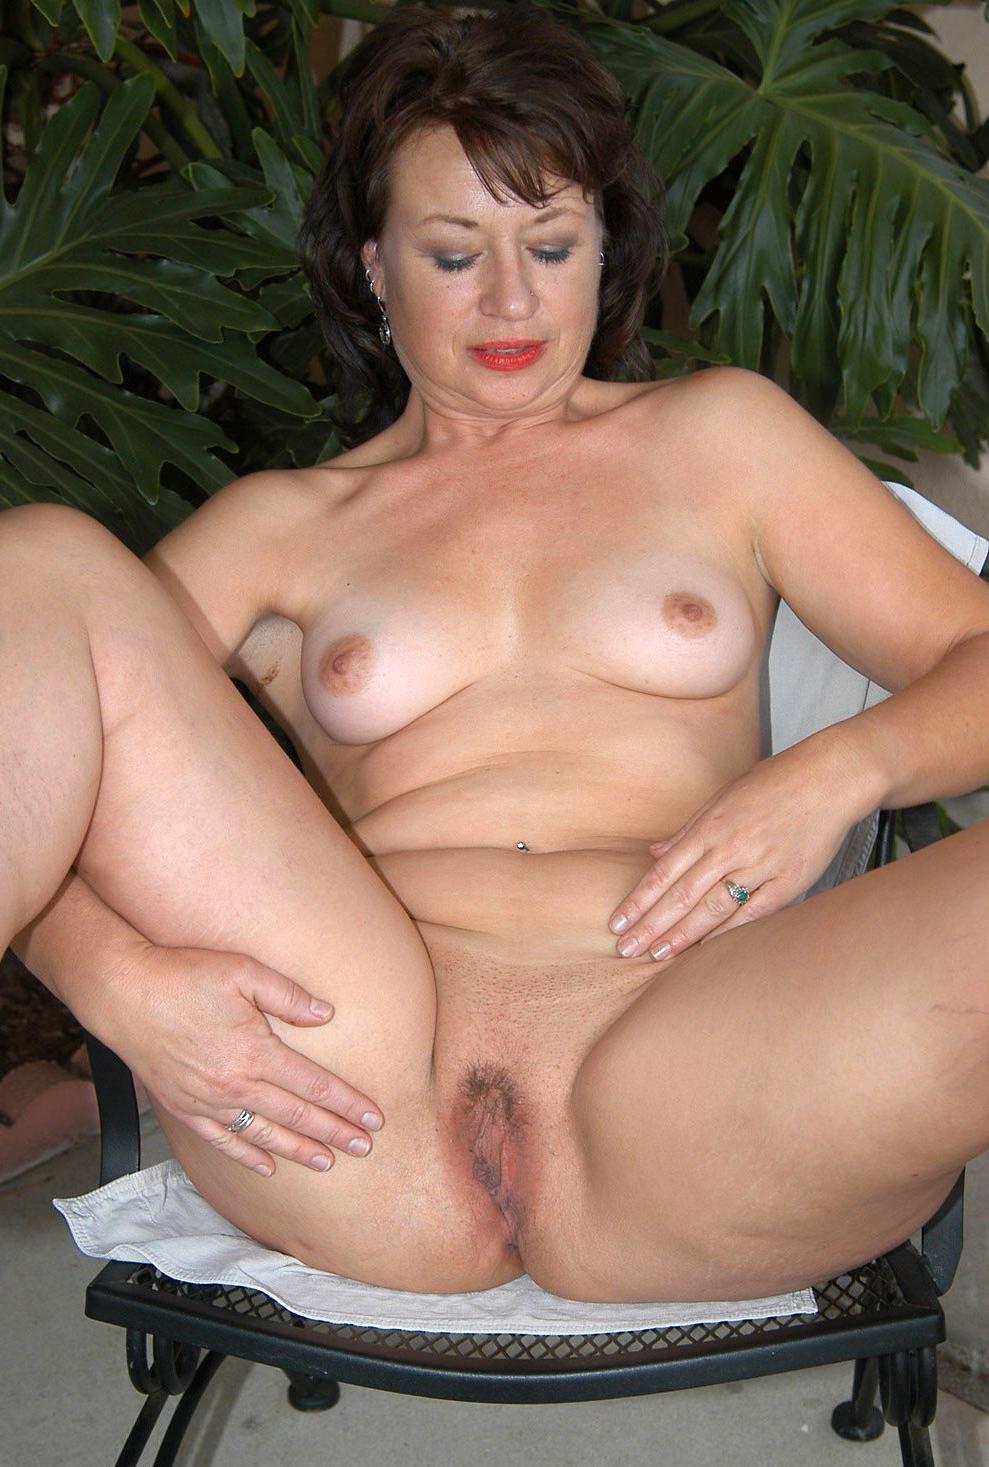 Olderwomen. com hd nude pics